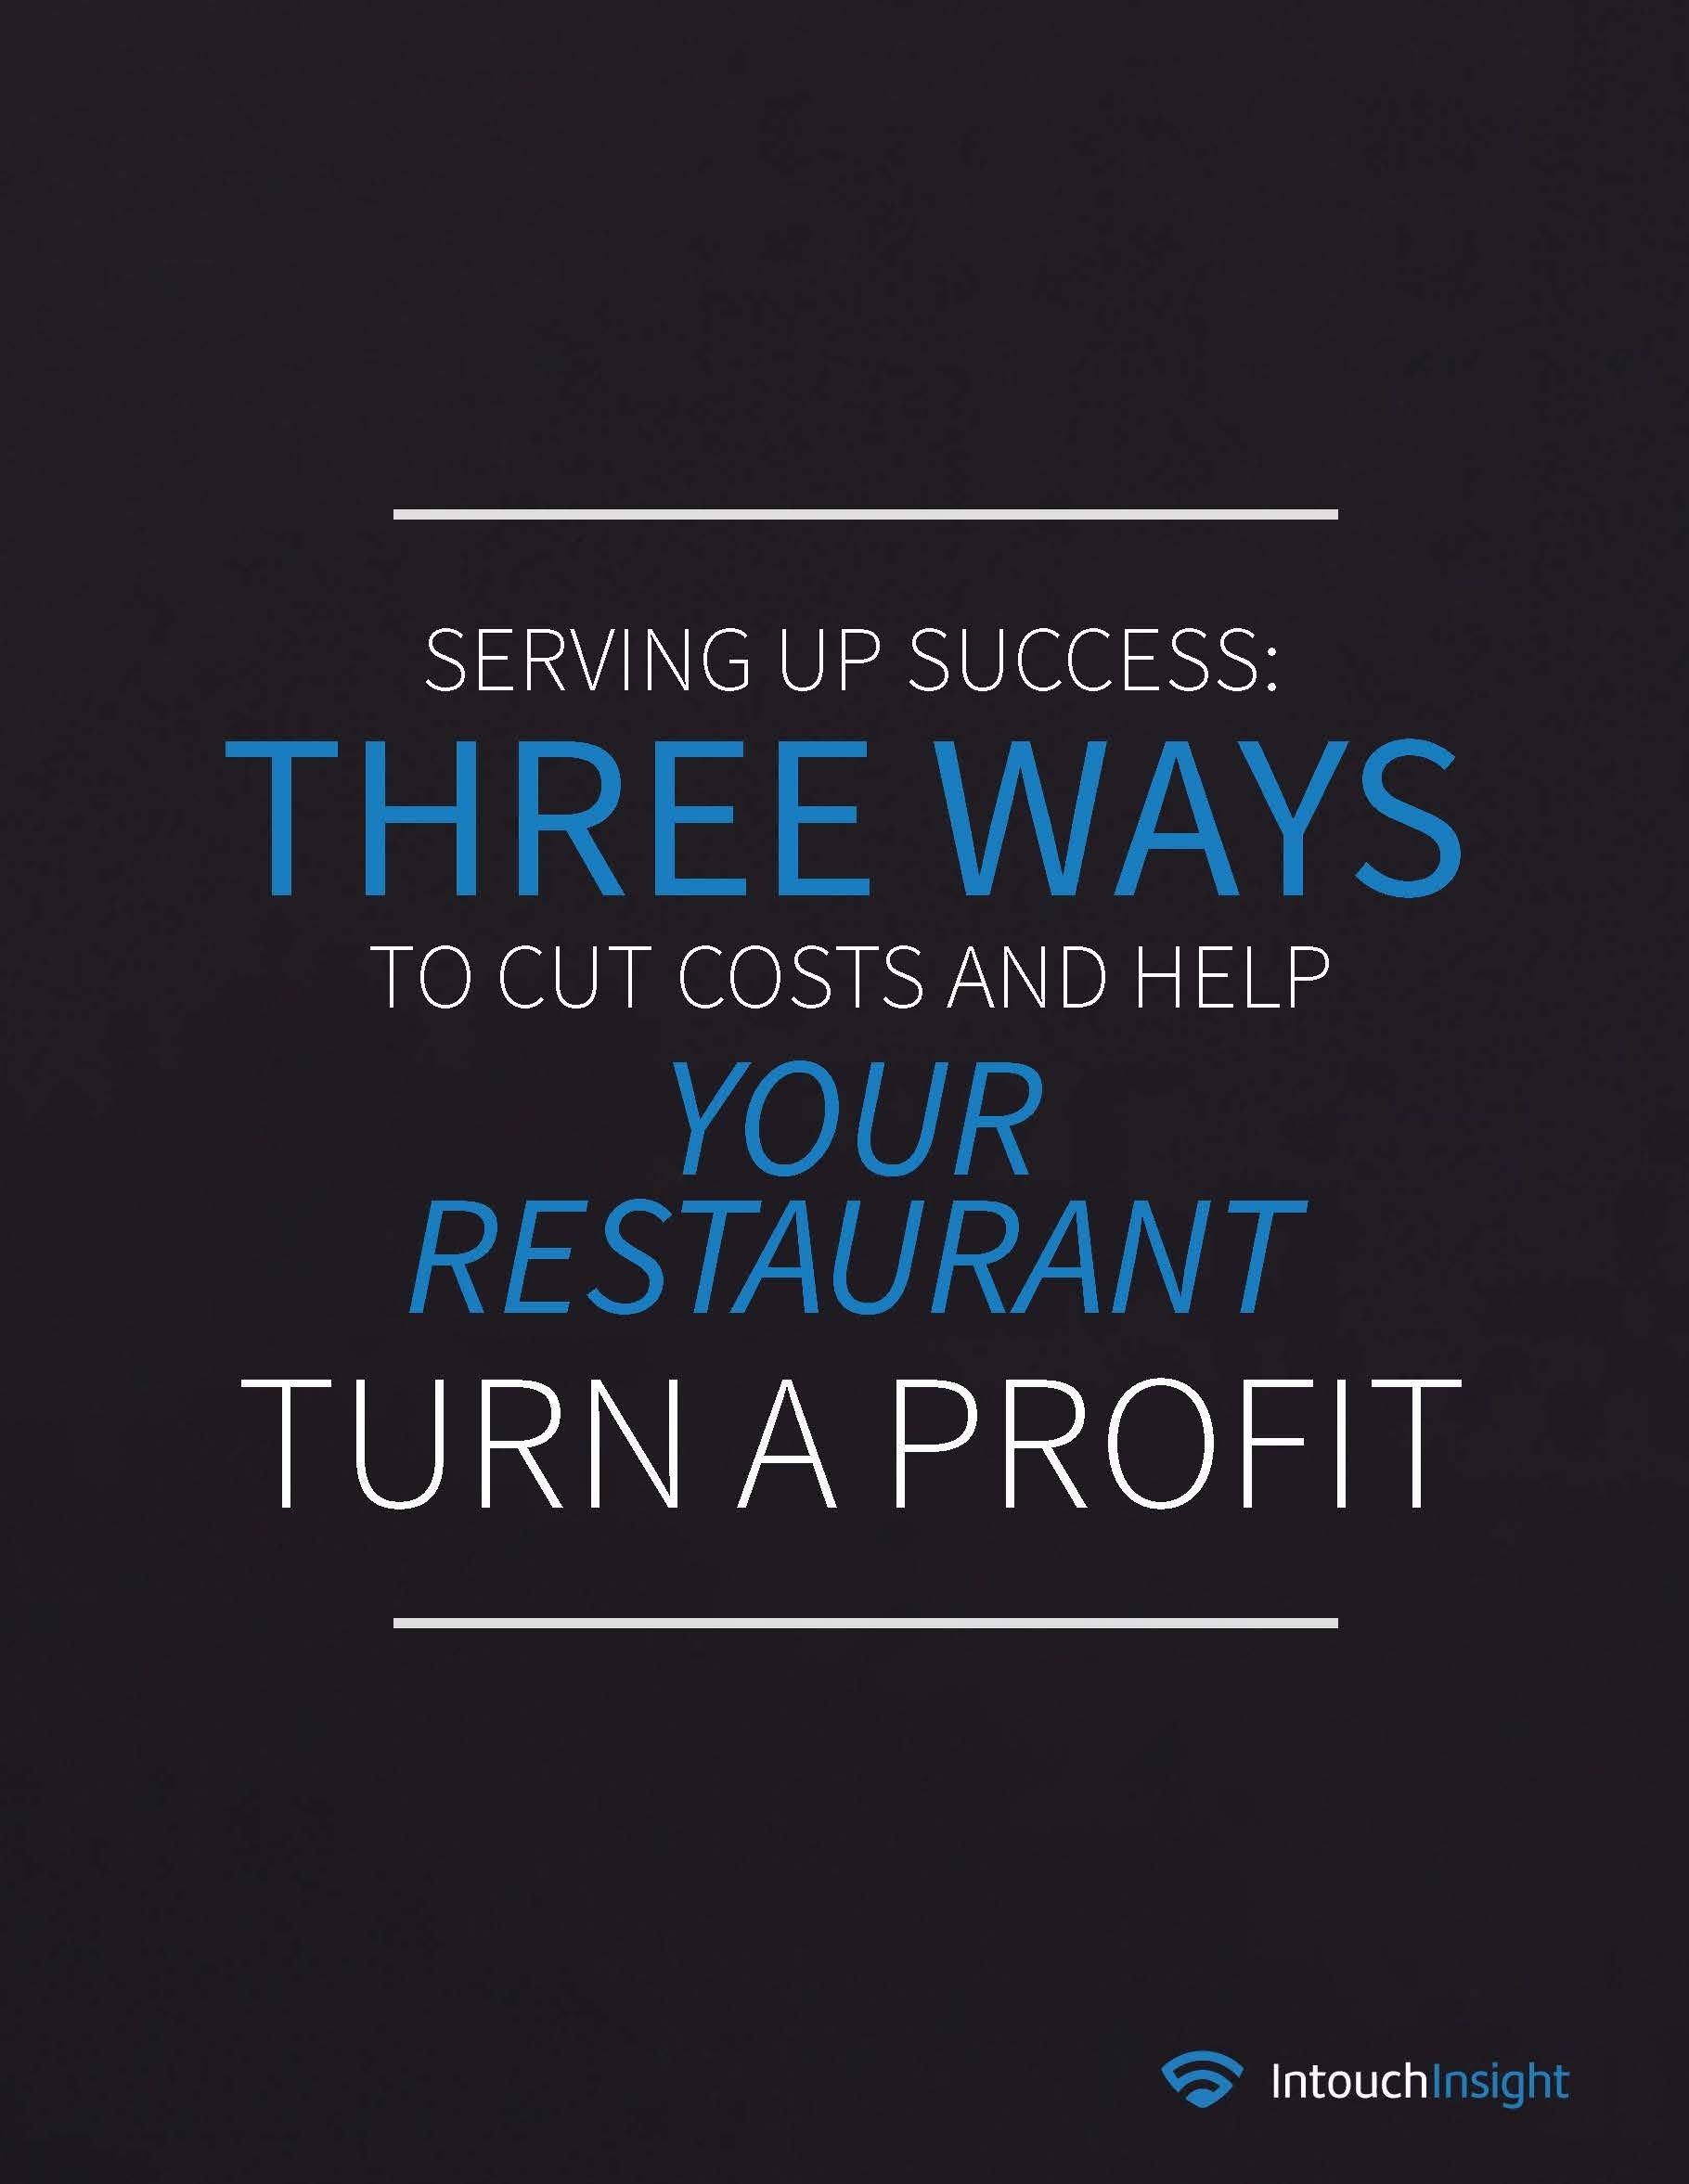 Three Ways to Cut Restaurant Costs